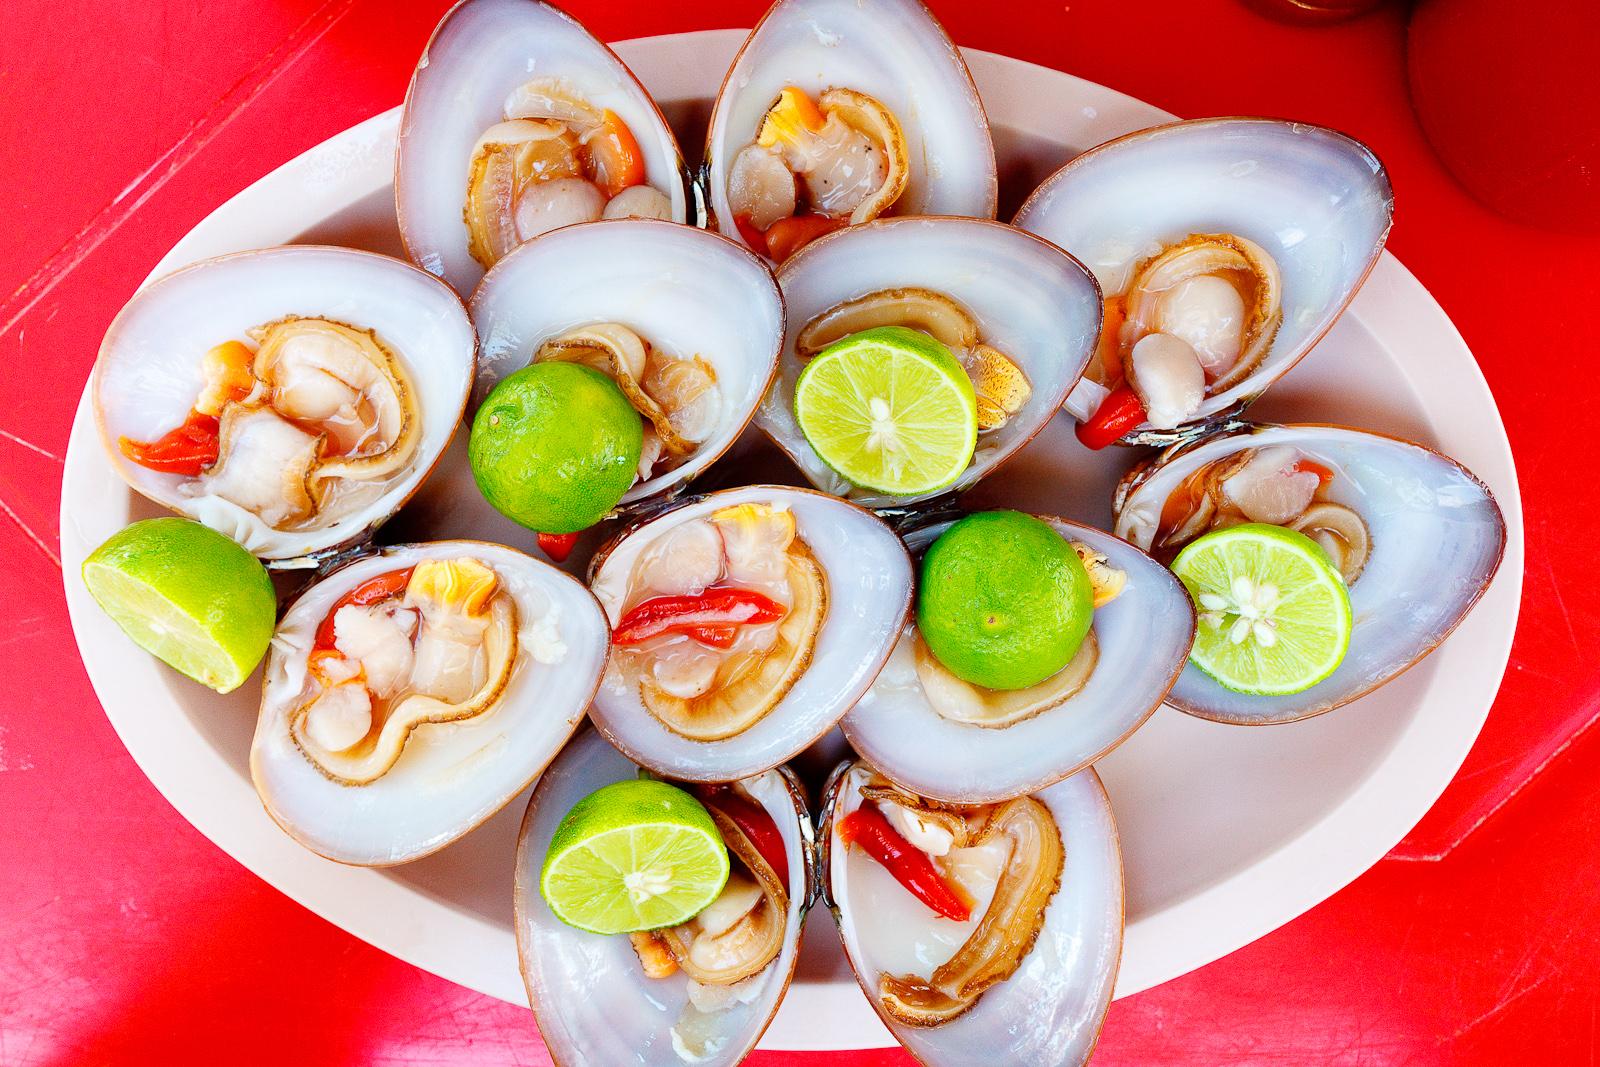 Almejas chocolatas (Live chocolate clams) (MXP $35)